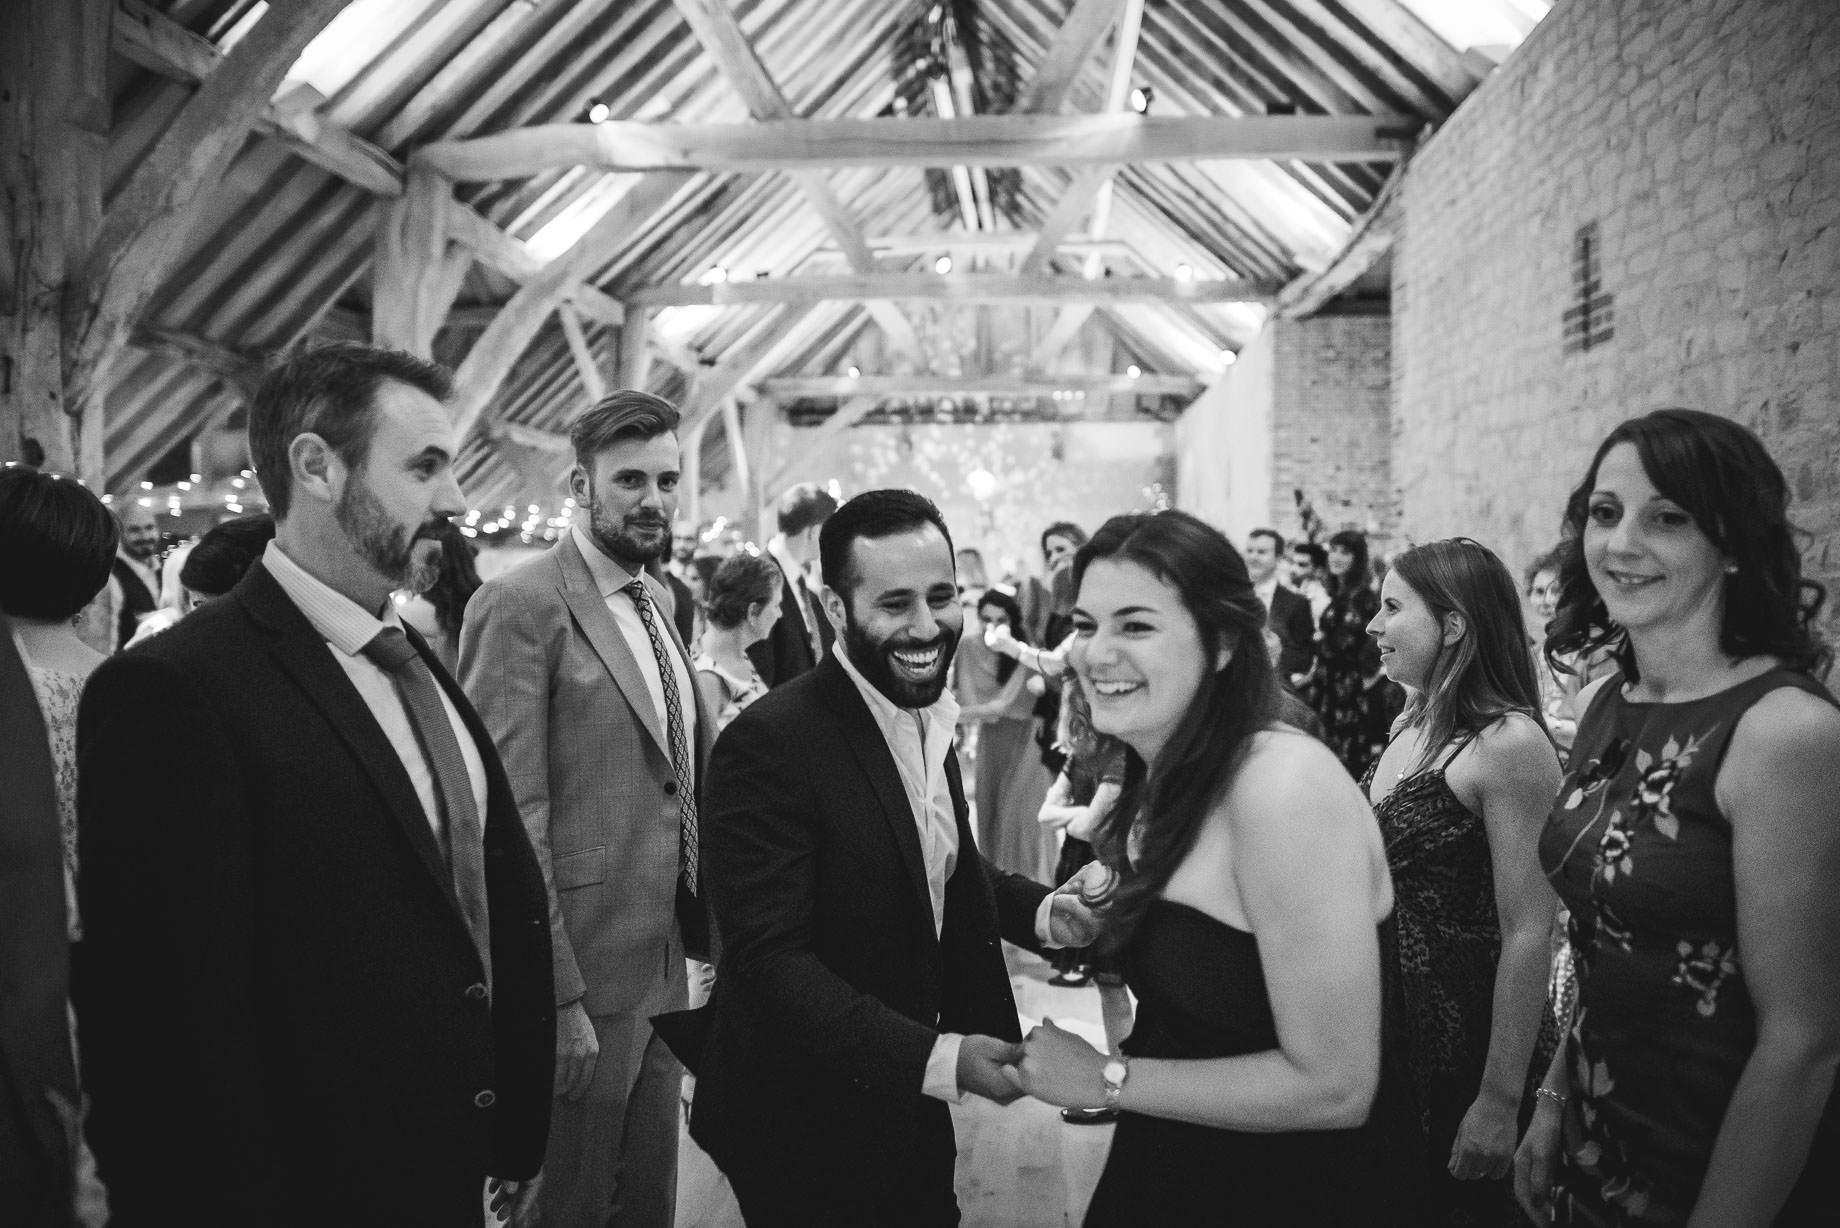 bury-court-barn-wedding-photography-guy-collier-photography-nadia-tom-177-of-184